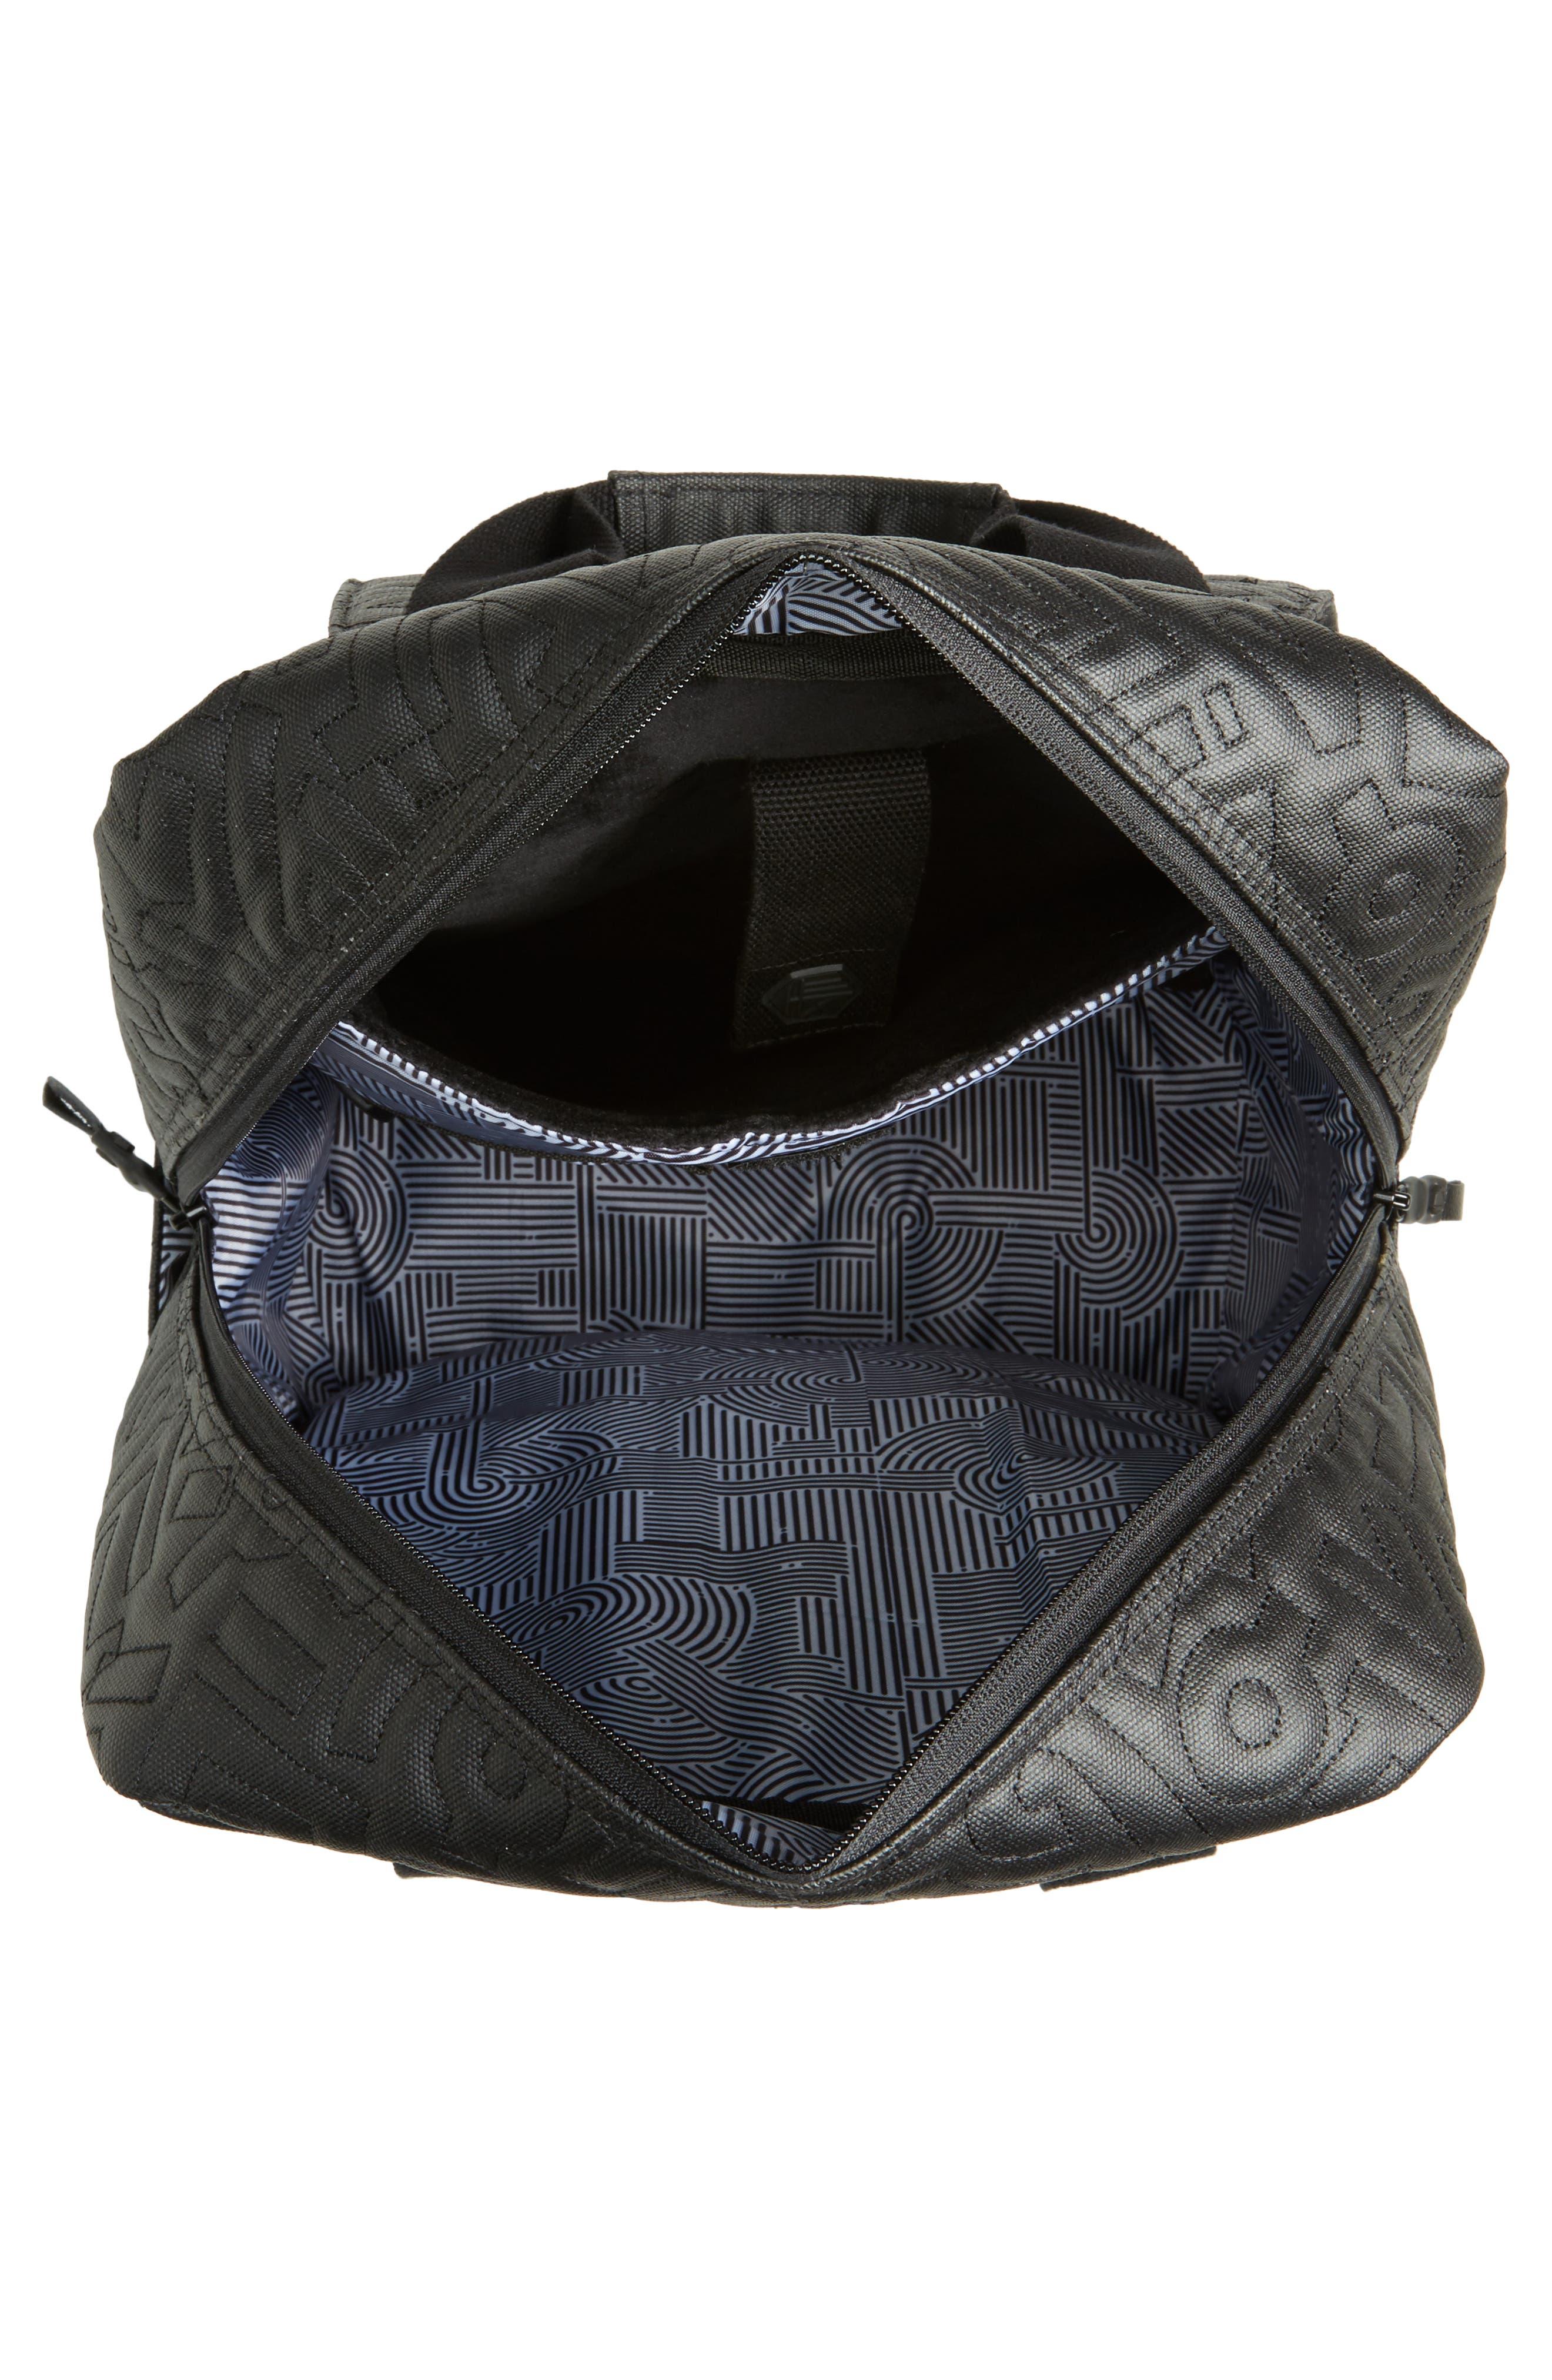 x Aaron De La Cruz Convertible Backpack,                             Alternate thumbnail 4, color,                             003